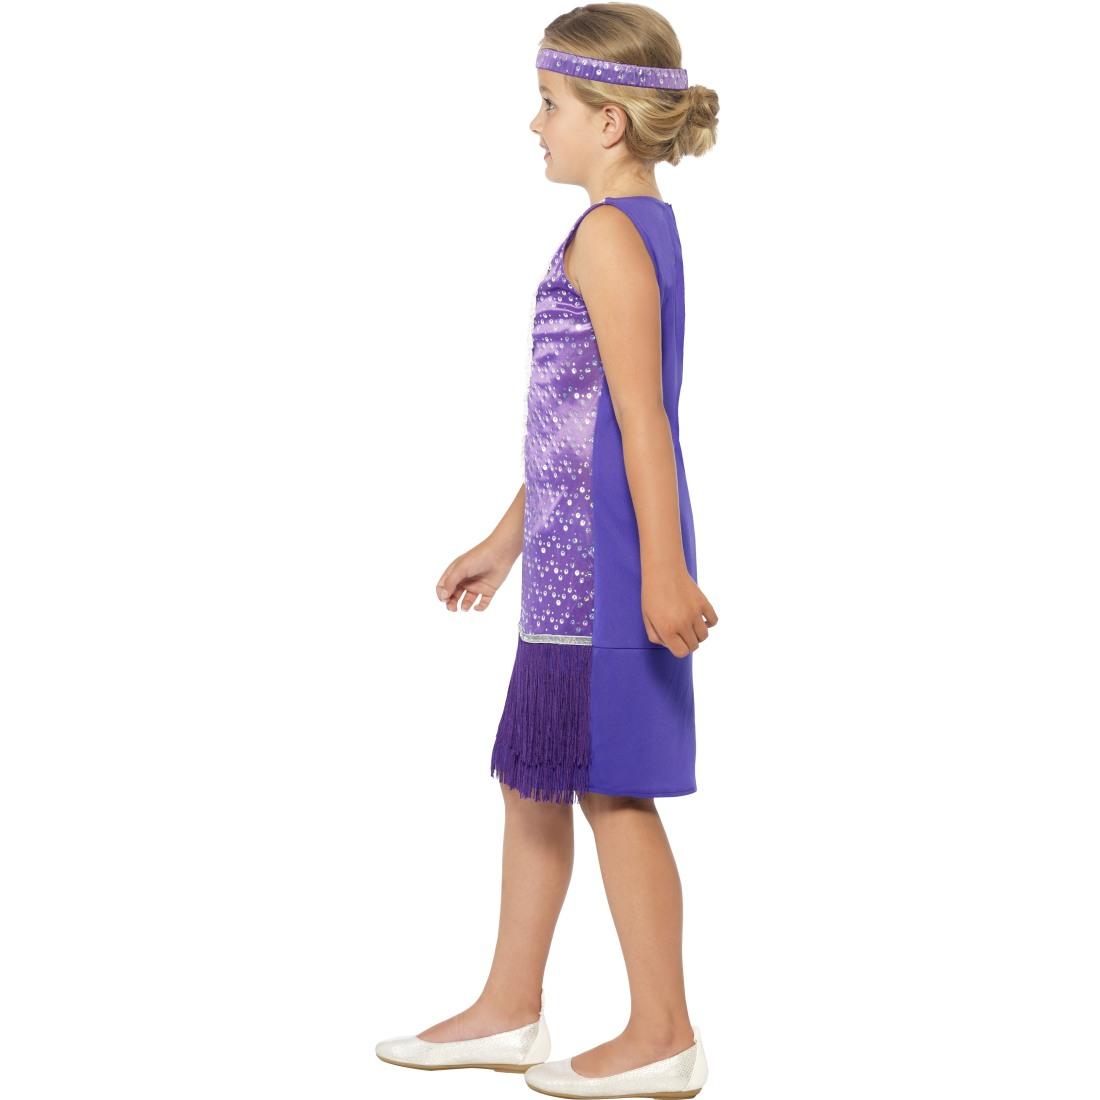 20er jahre kost m kinder charleston kleid mit haarband. Black Bedroom Furniture Sets. Home Design Ideas